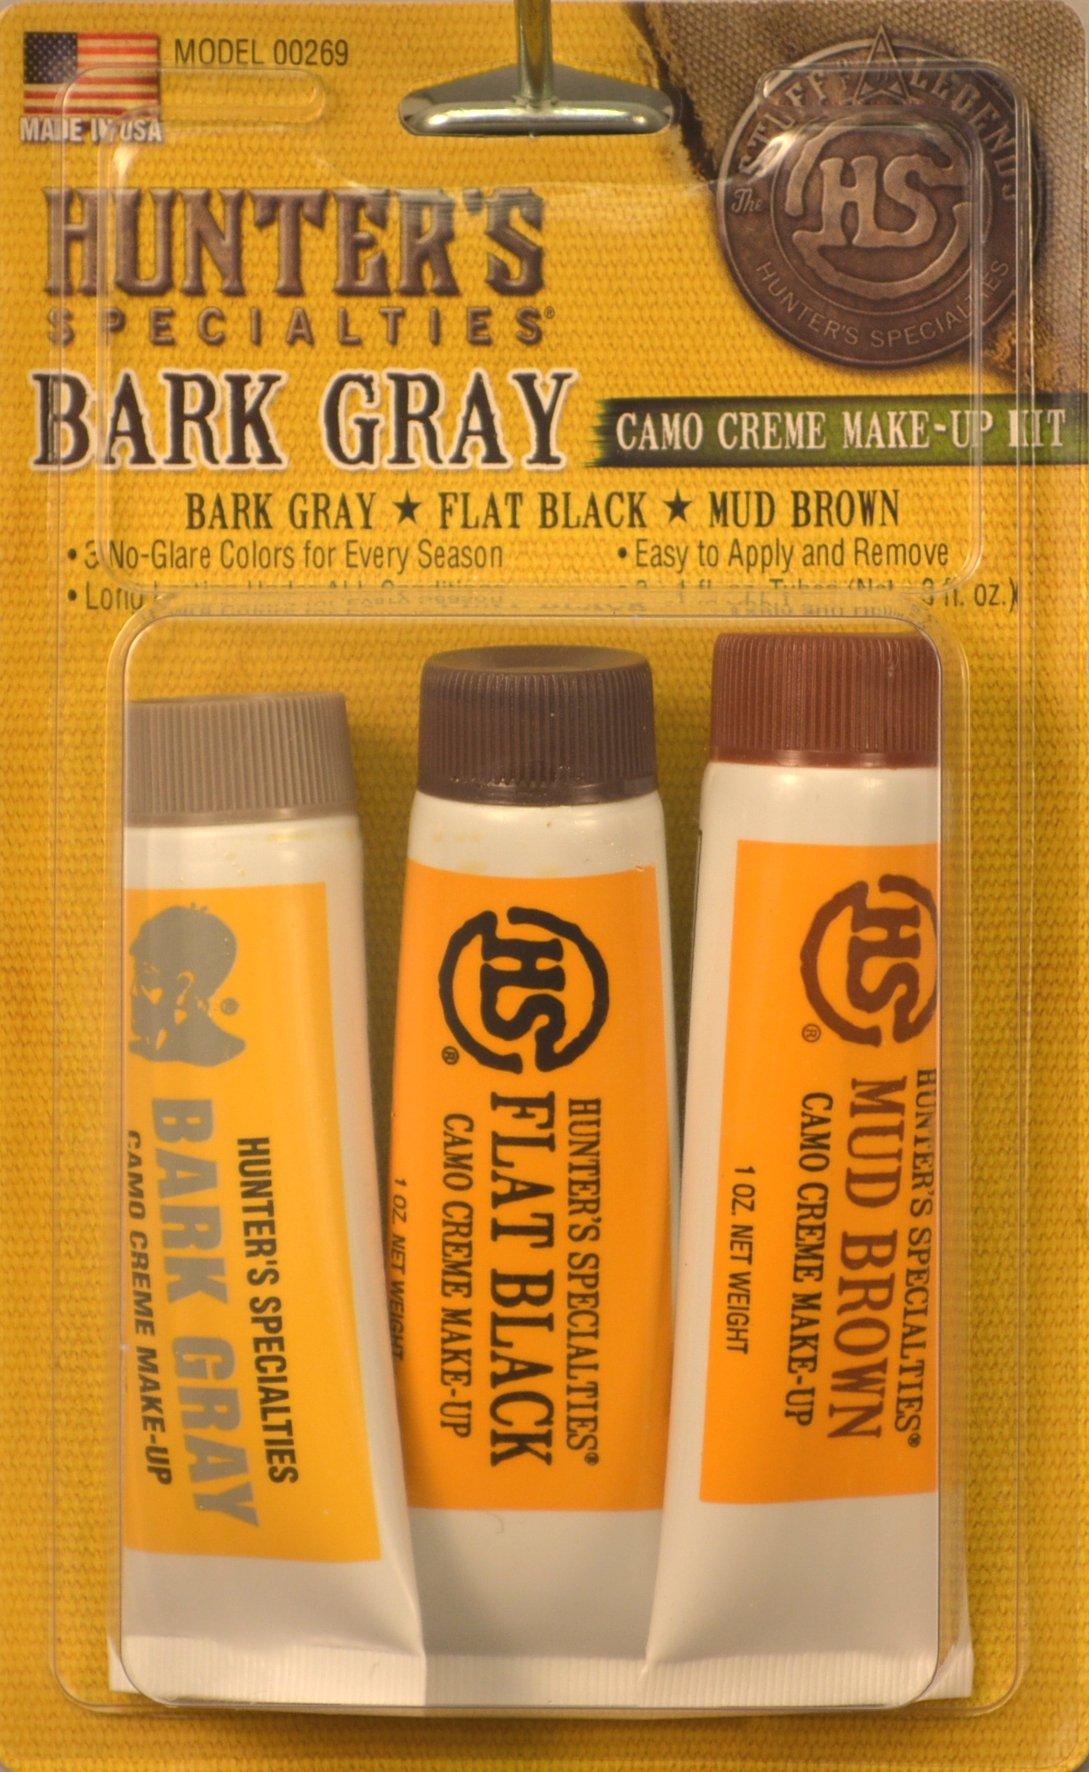 Hunters Specialties Creme Tube Makeup Kit (Gray Camo)